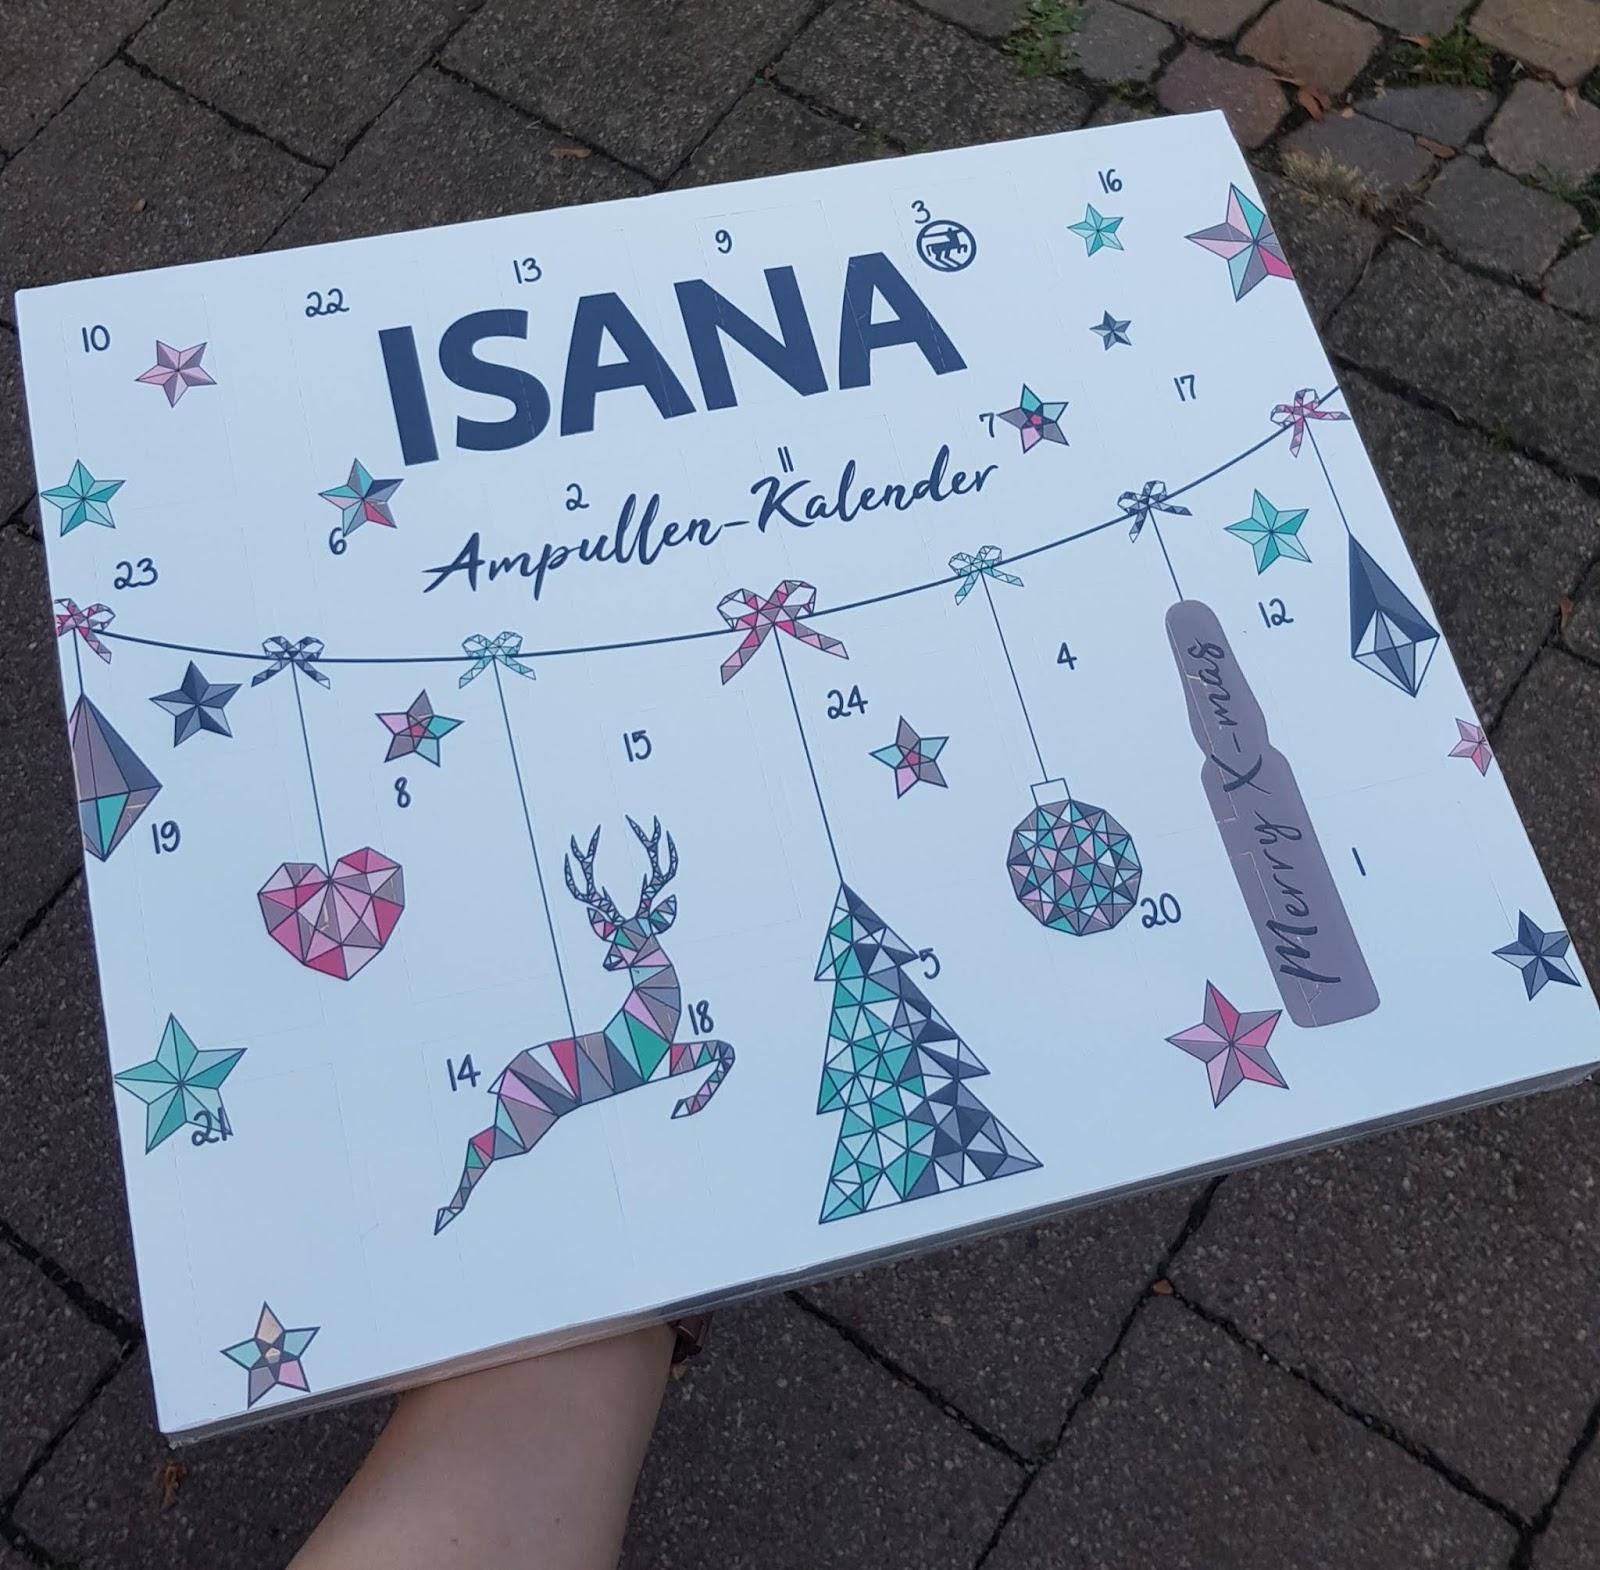 Weihnachtskalender Rossmann.Wonderful Moments Rossmann Isana Ampullen Kalender